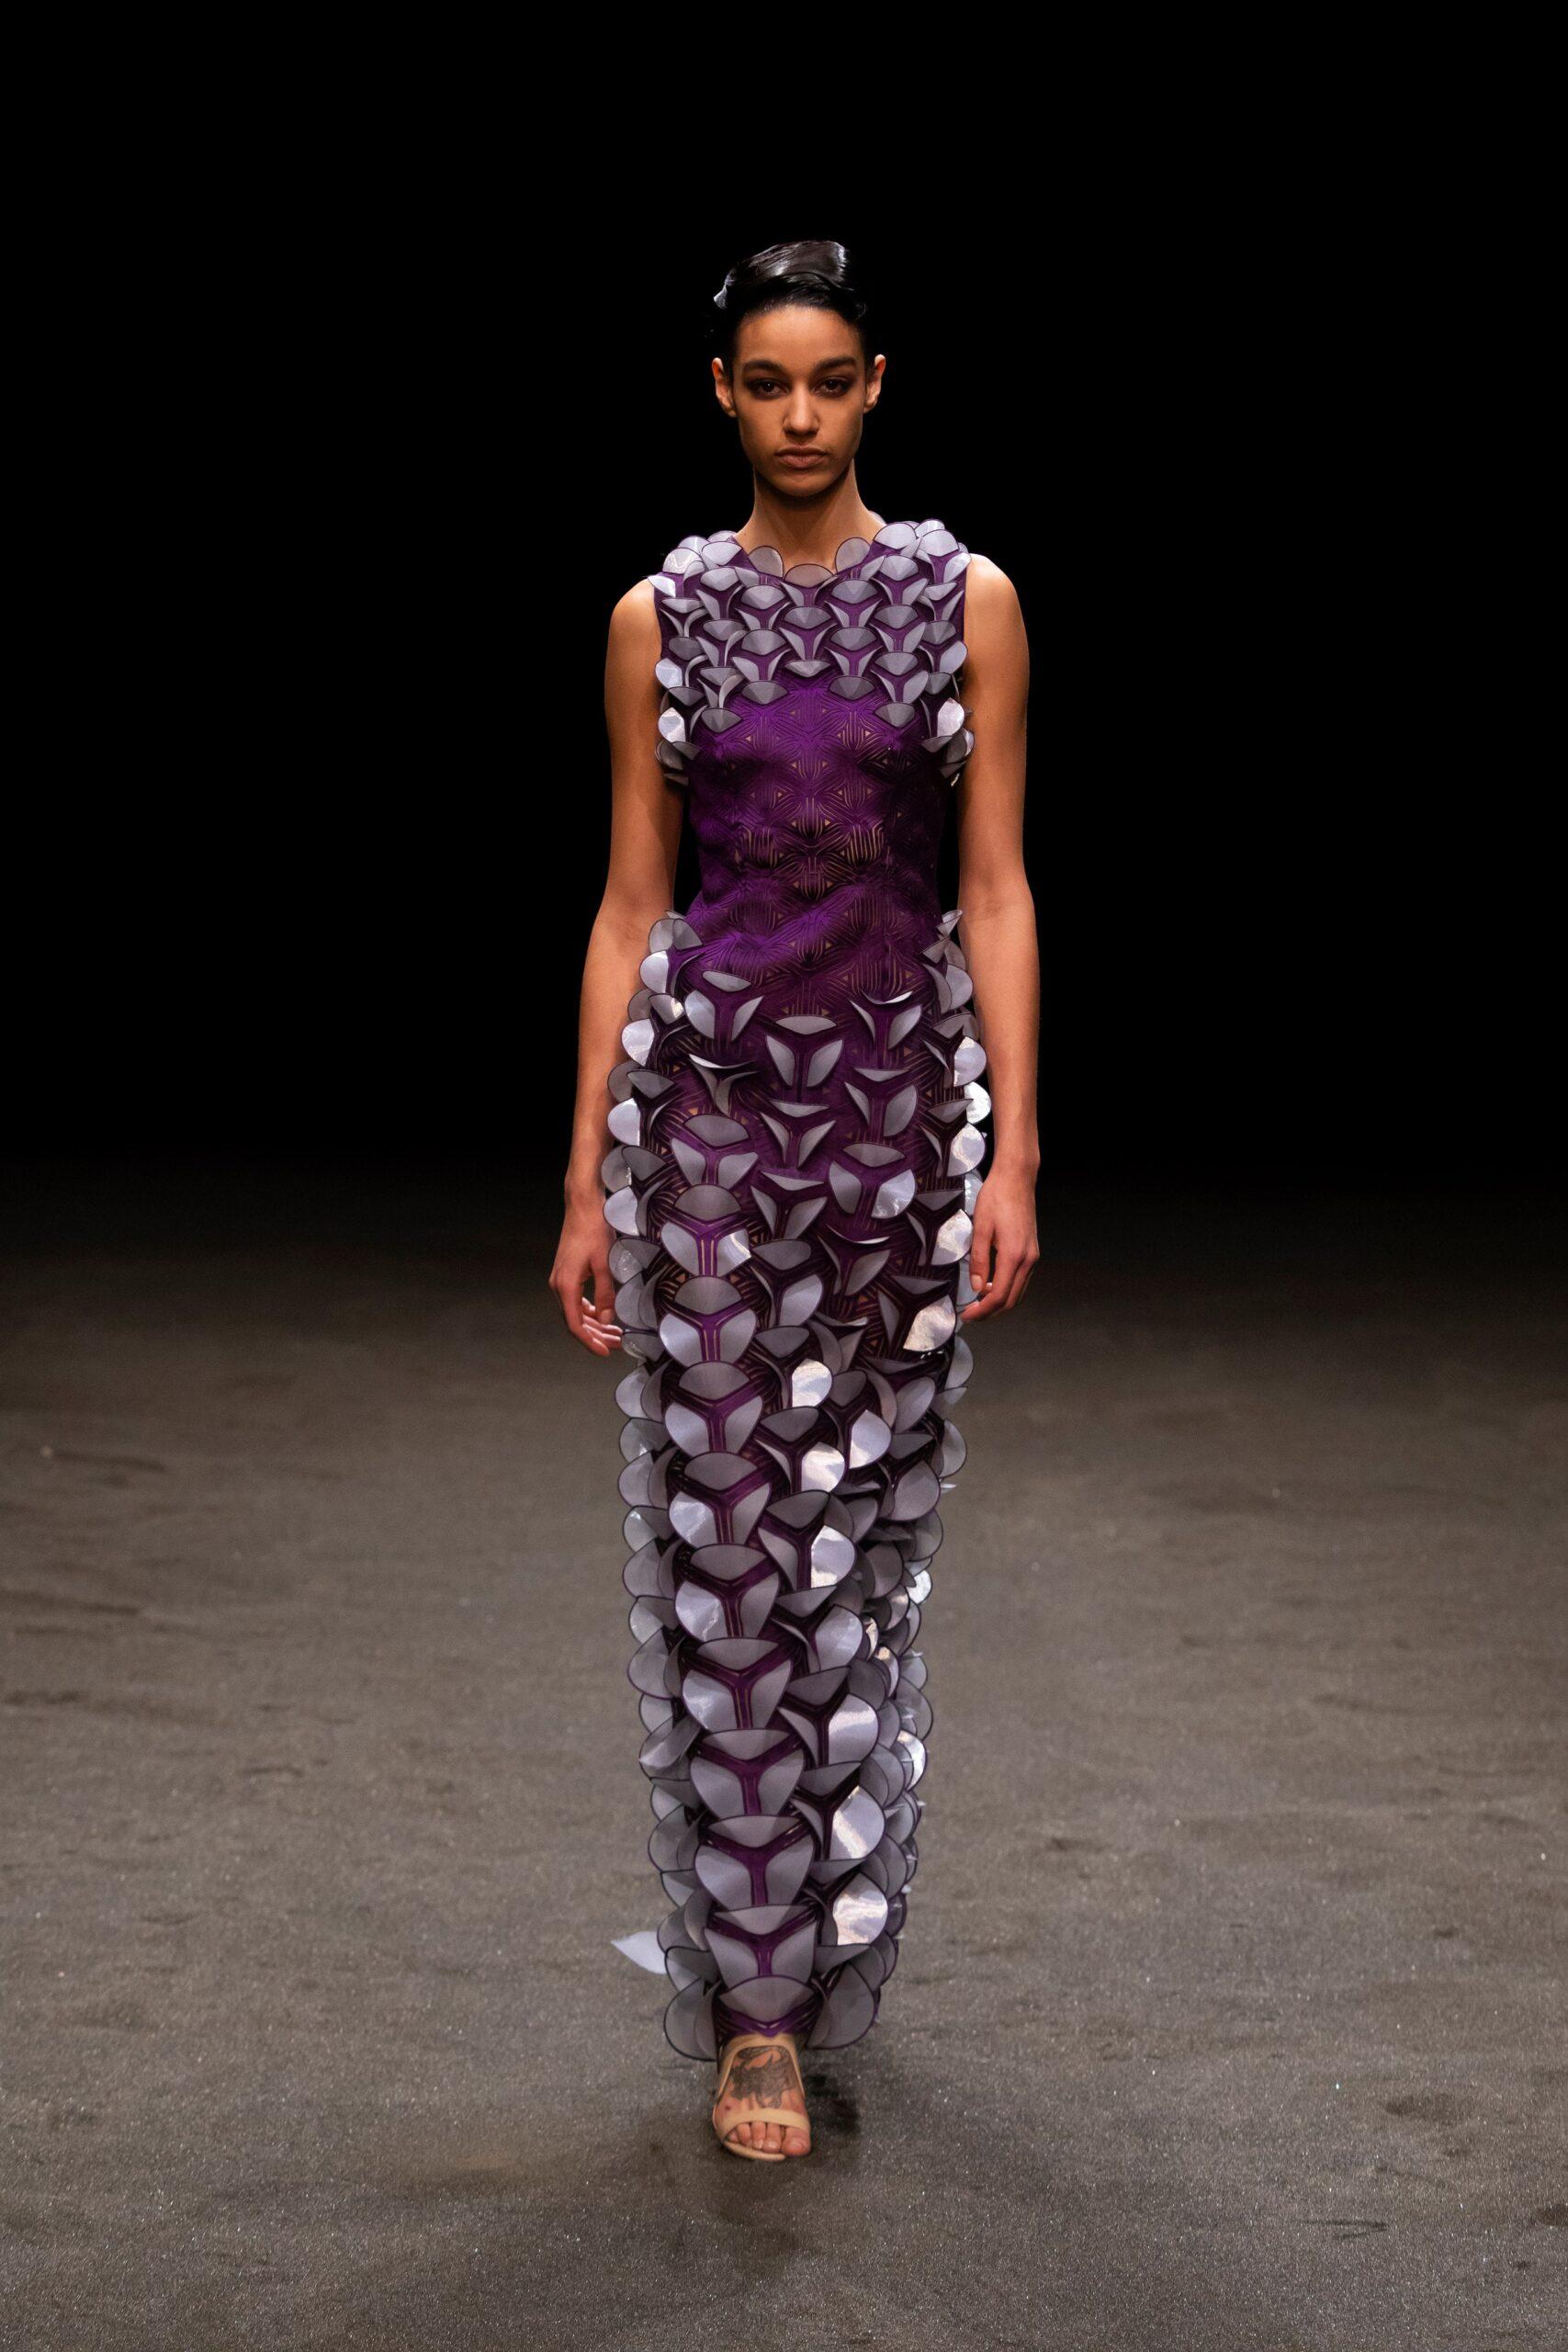 00015 Iris van Herpen Couture Spring 21 credit Gio Staiano